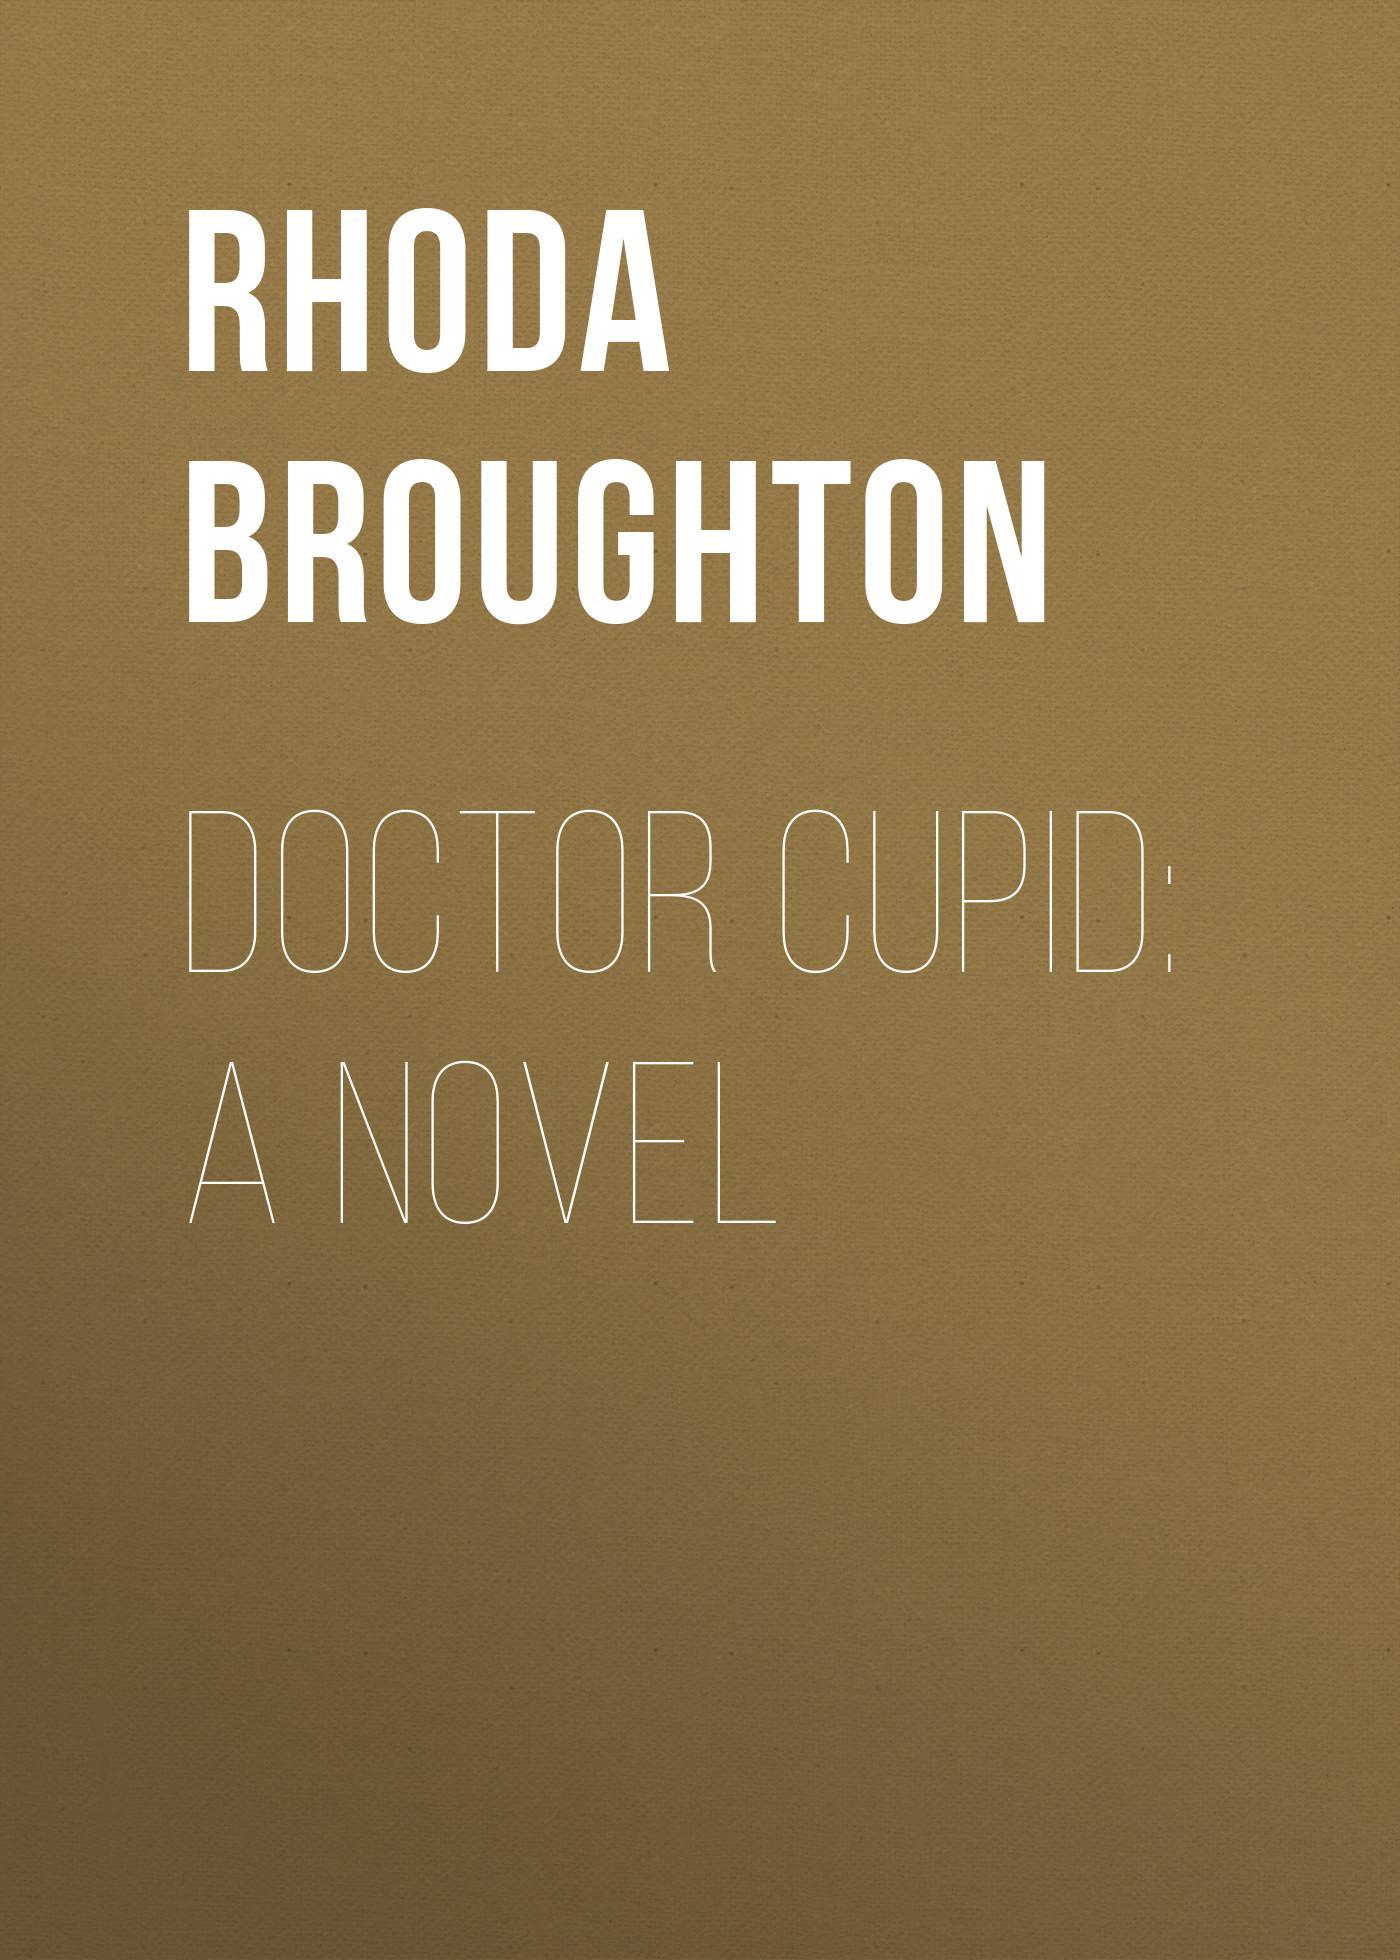 Broughton Rhoda Doctor Cupid: A Novel rhoda broughton nancy